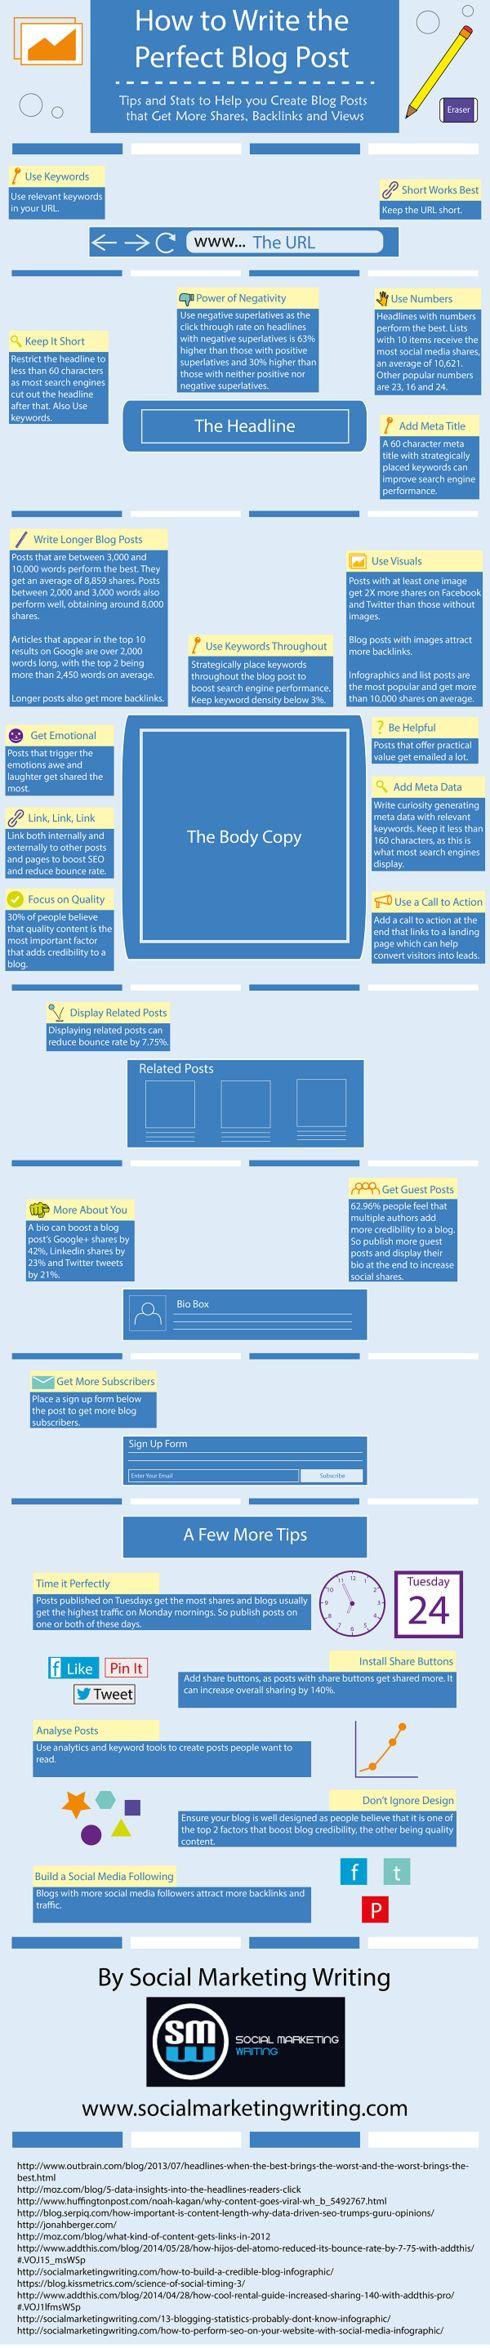 Steven Hughes - DashBurst 24 Ways to Optimize your Blog Post